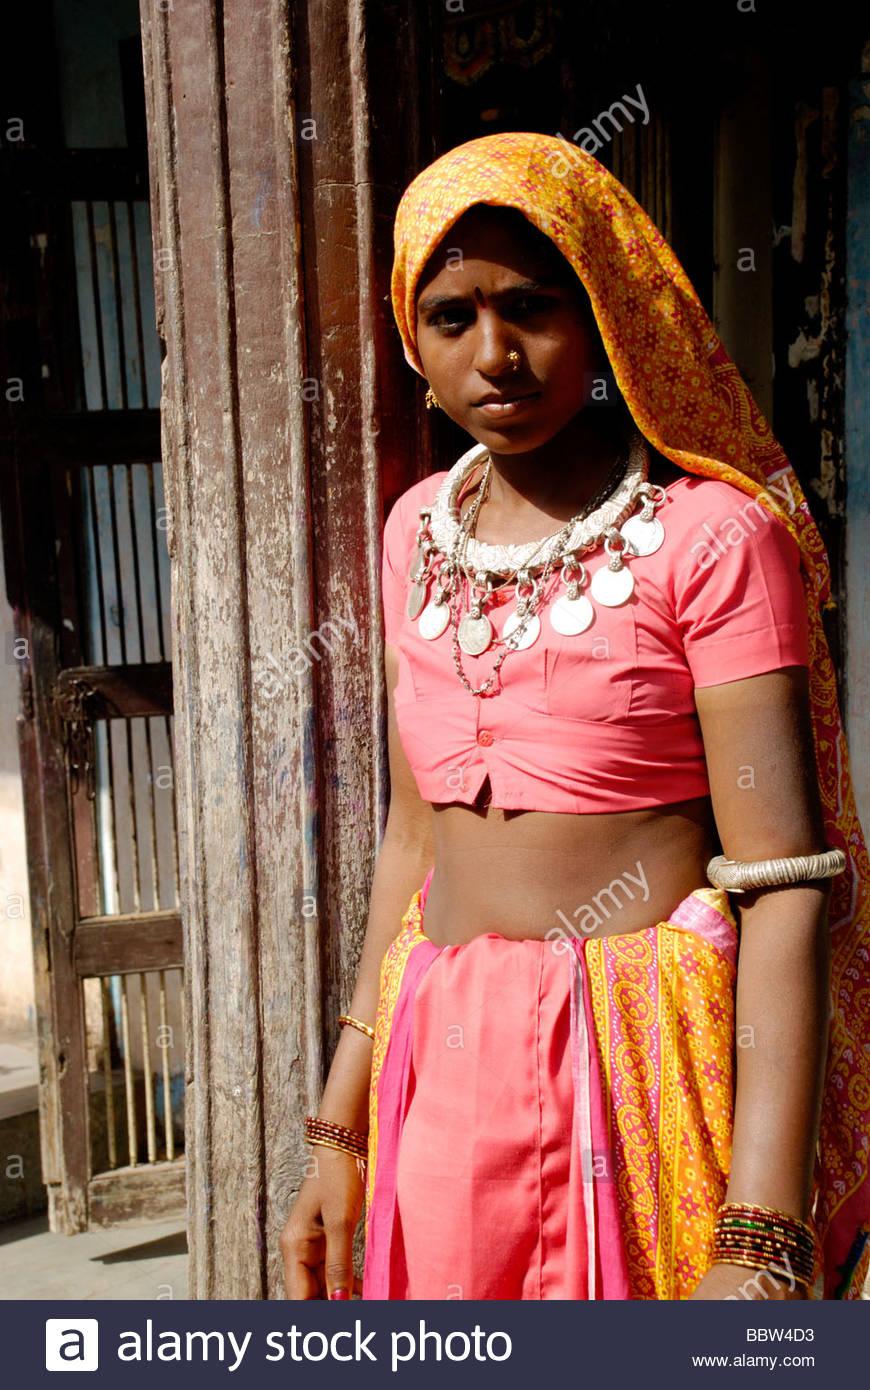 People Of Rural Area In Gujarat India Stock Image